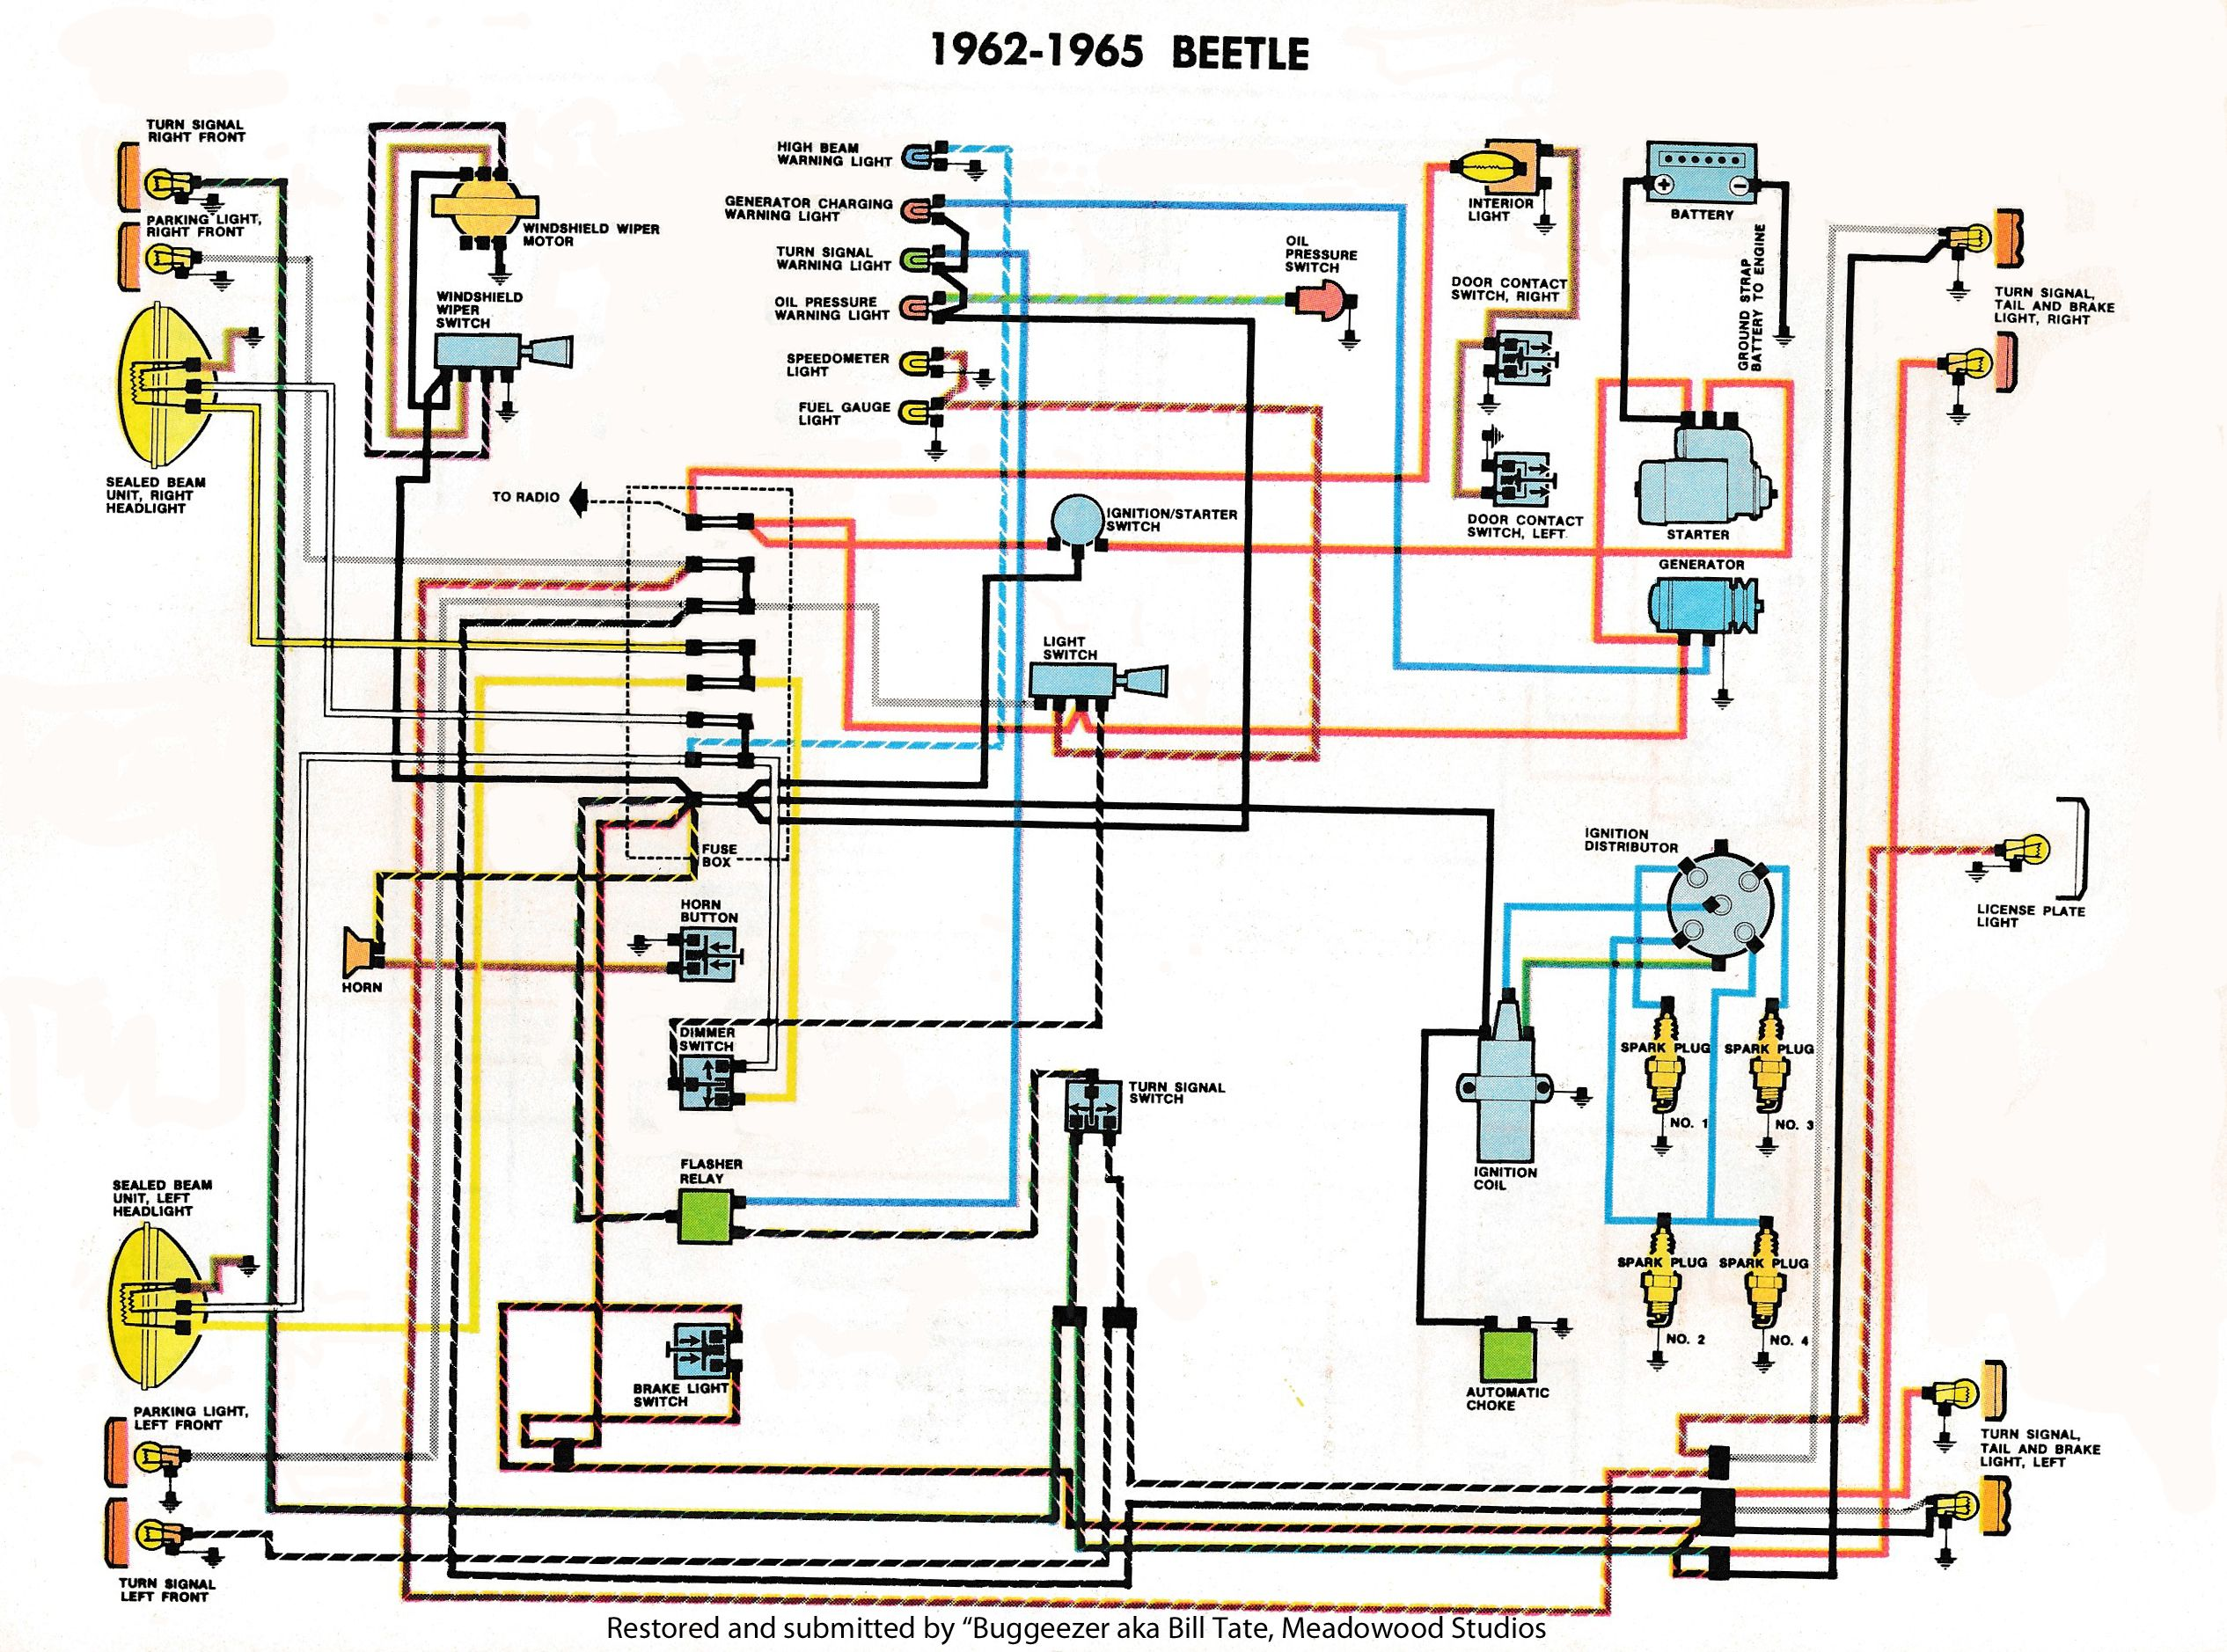 77 El Camino Wiring Diagram Schematic | schematic and ...